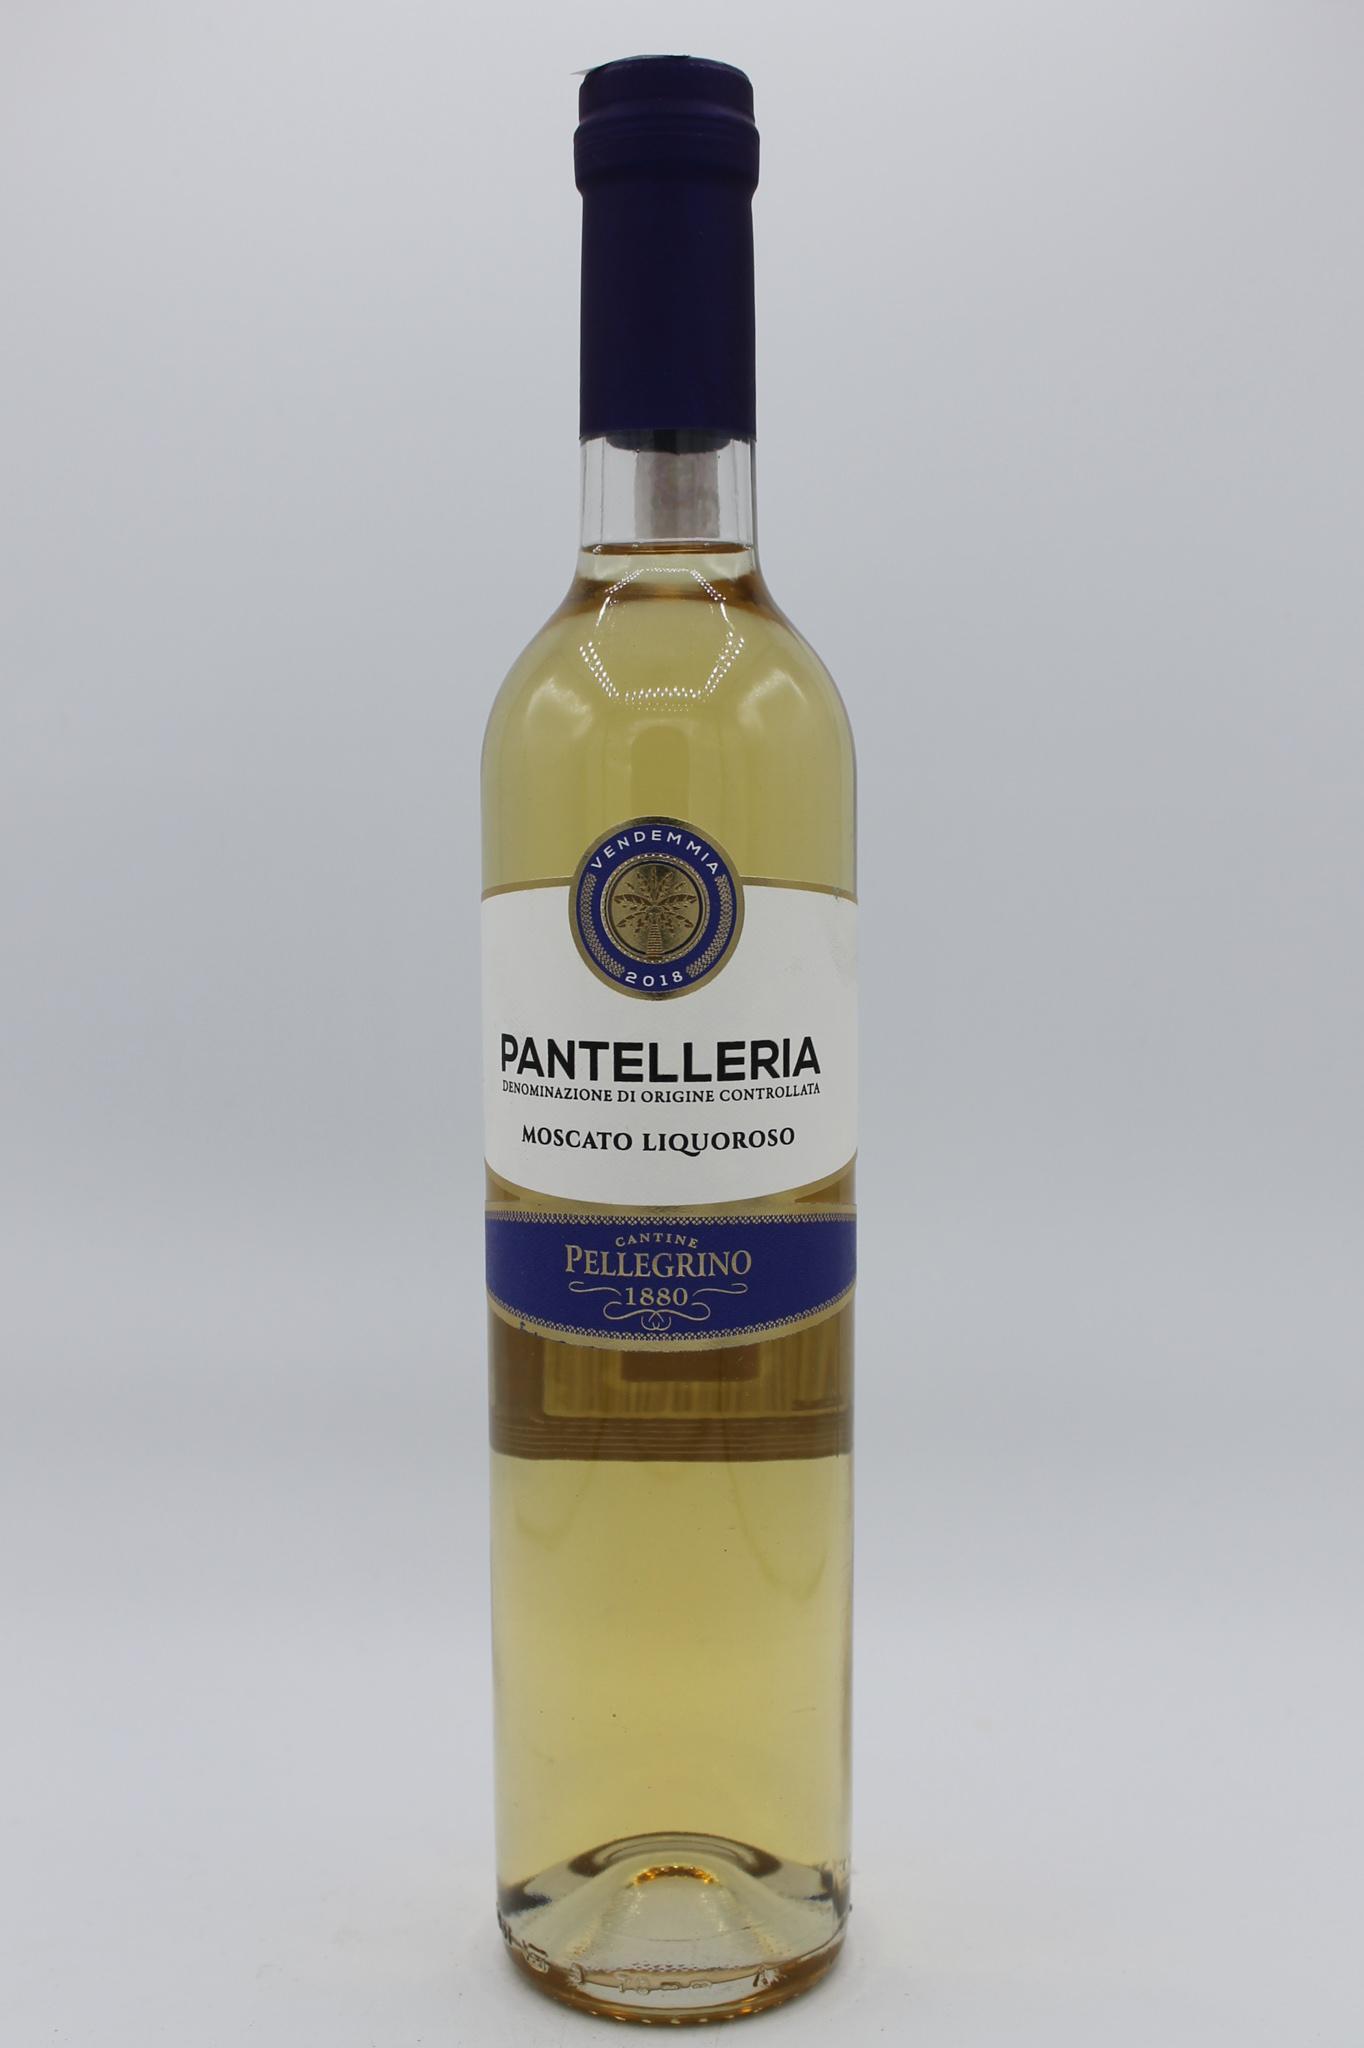 Pellegrino moscato di pantelleria 500ml.